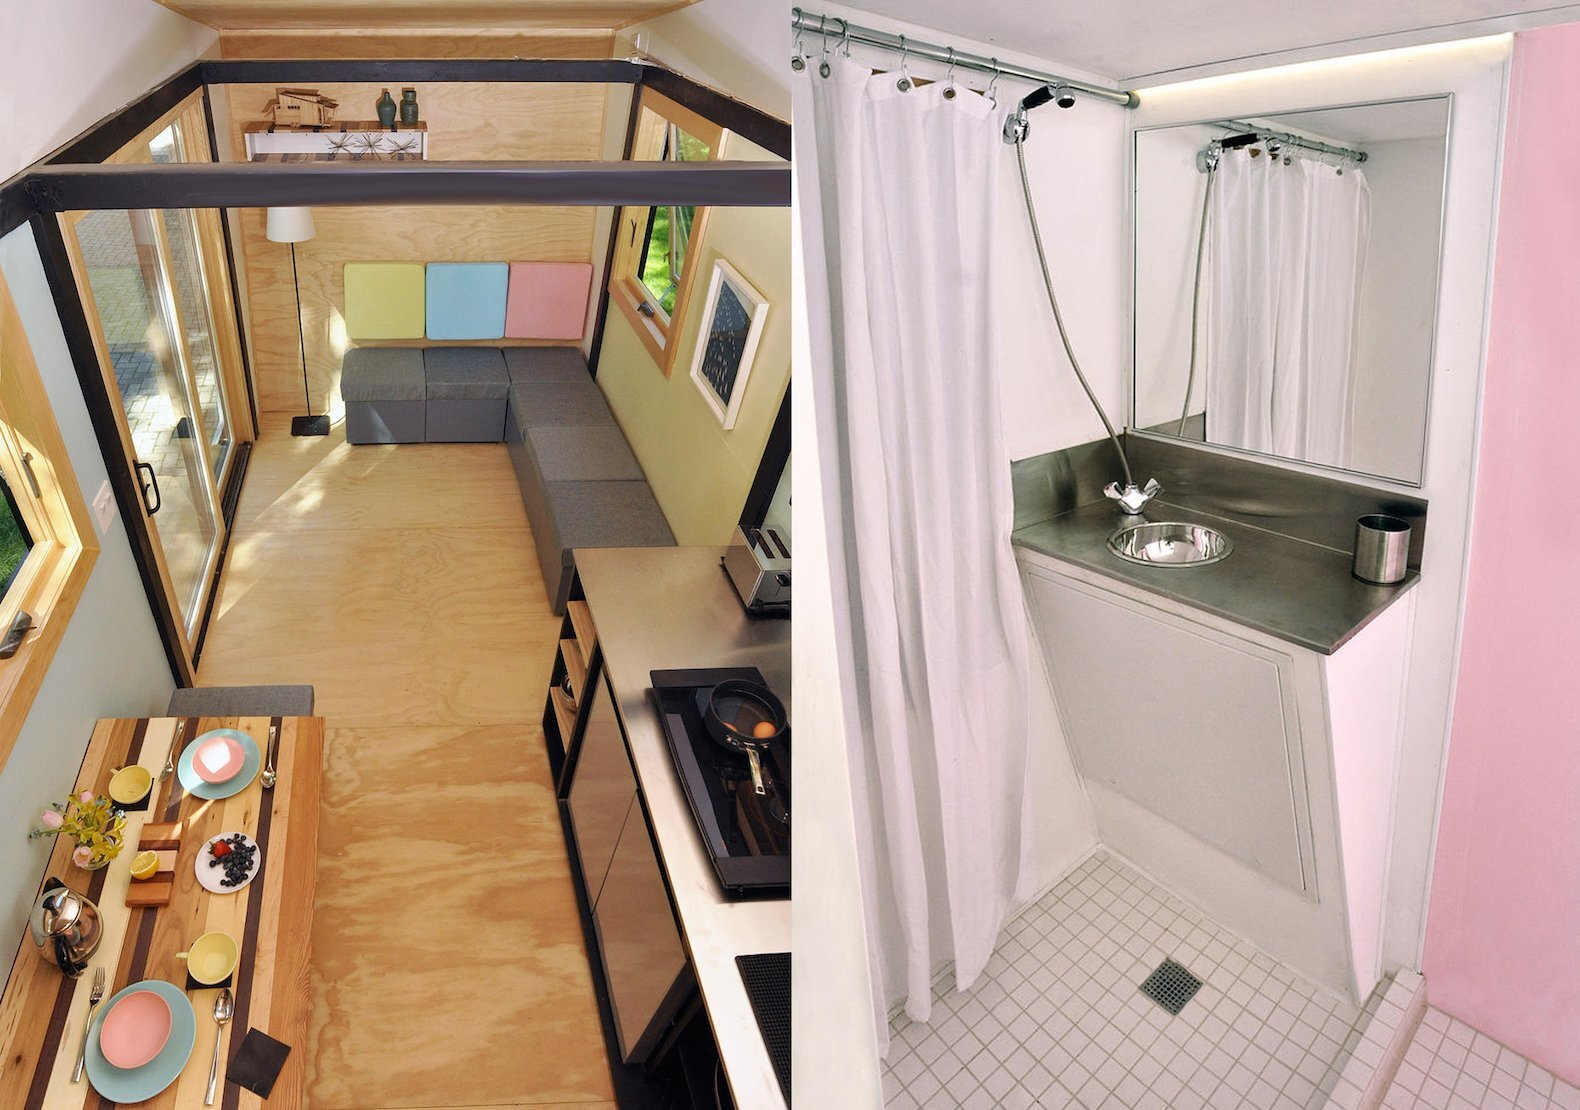 Tiny House - Toybox Tiny House - Frank Henderson and Paul Schultz - Illinois - Bathroom and Living Area - Humble Homes